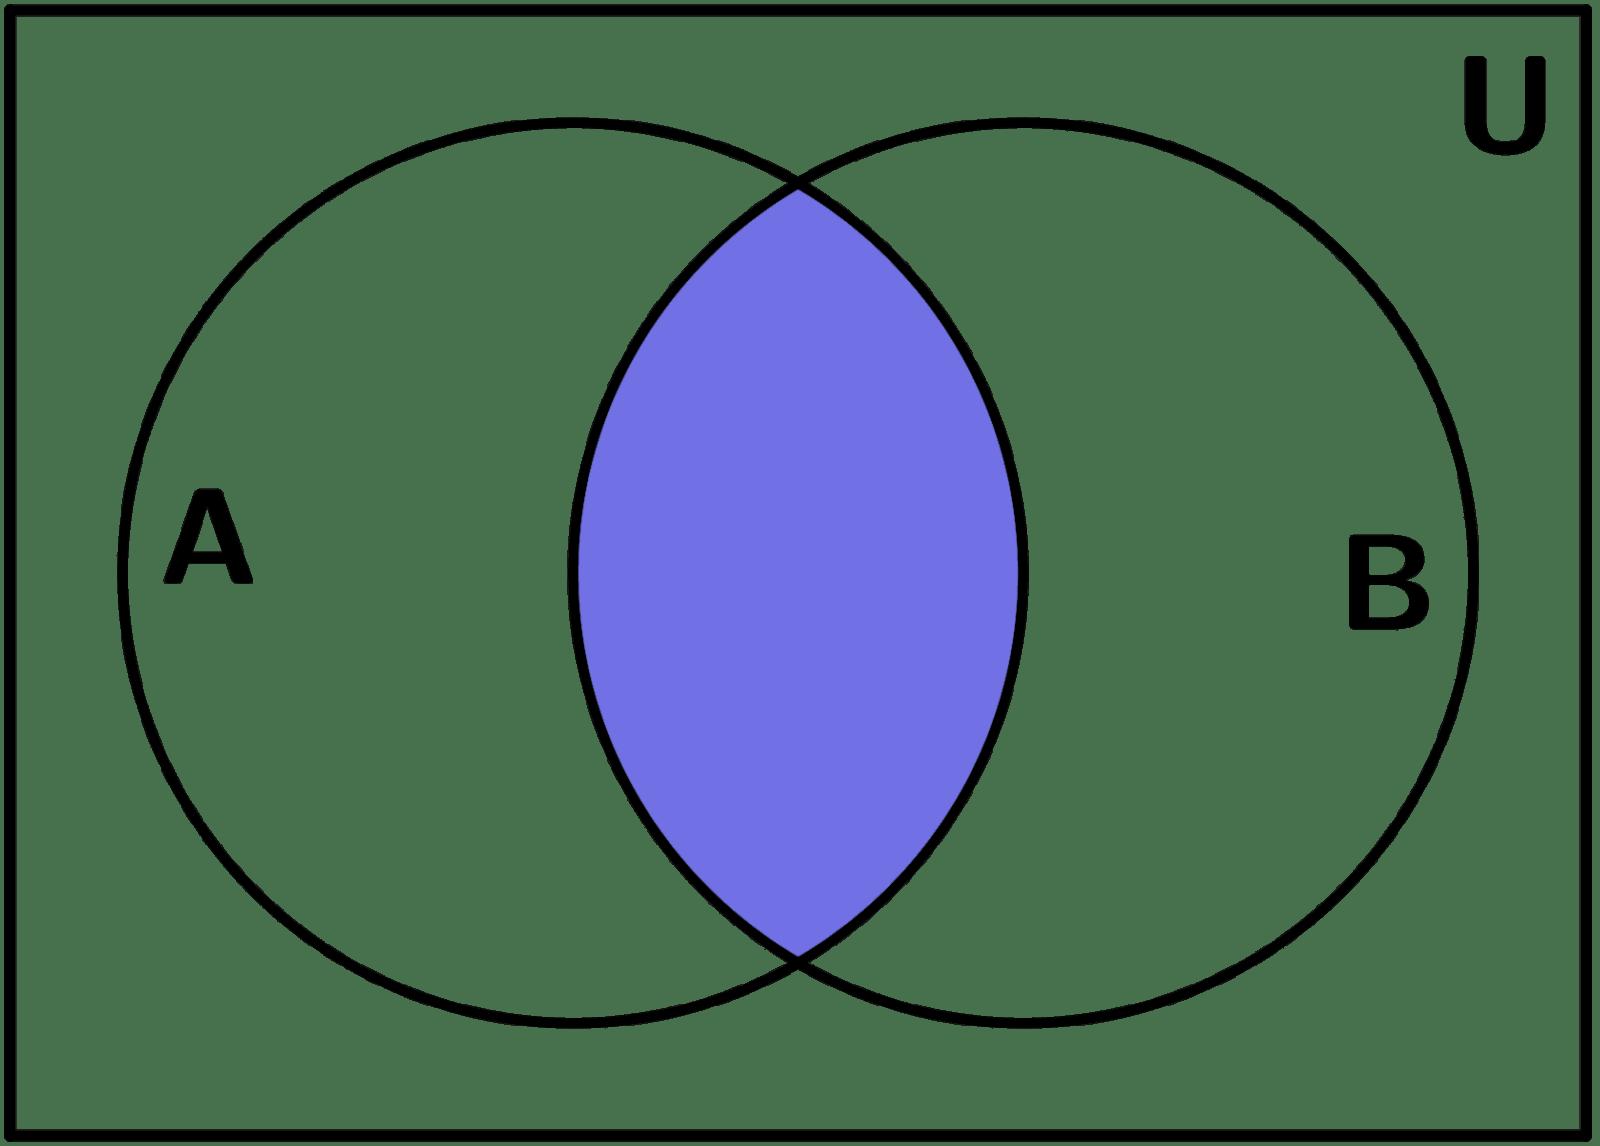 hight resolution of intersecci n diagrama de venn